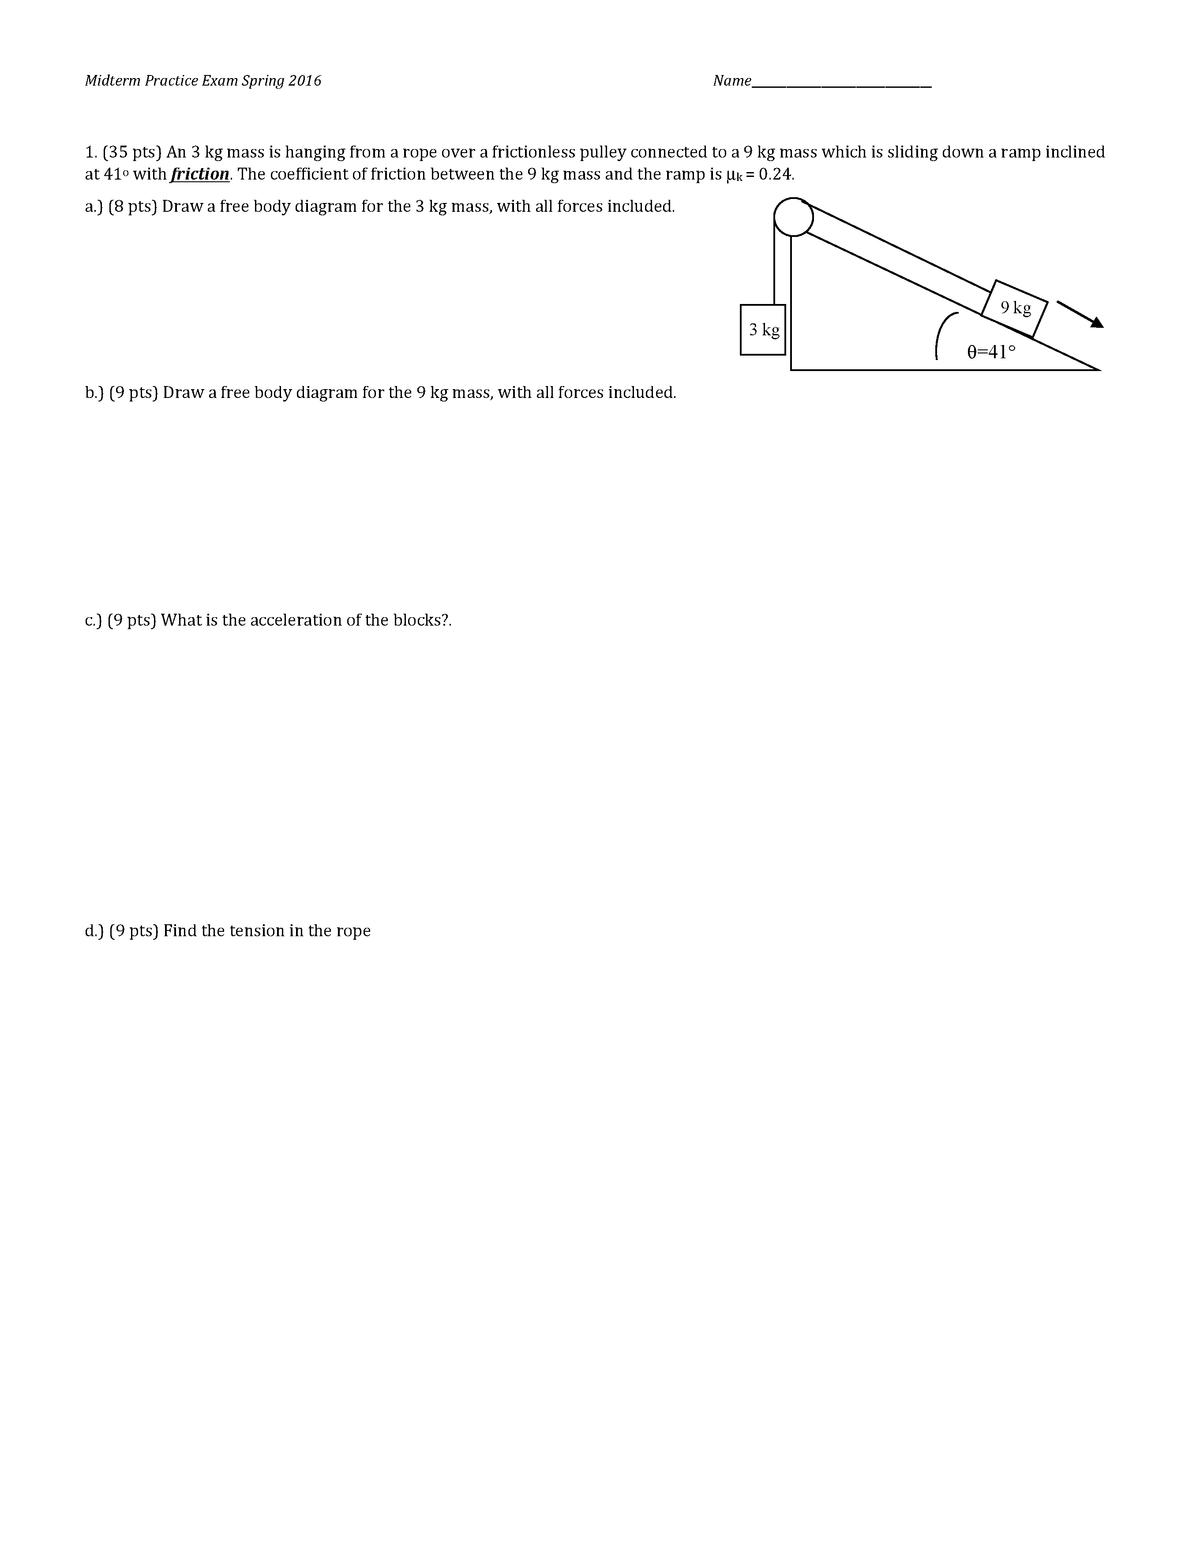 Sample  Practice Exam 4 April 2016  Questions - Midterm